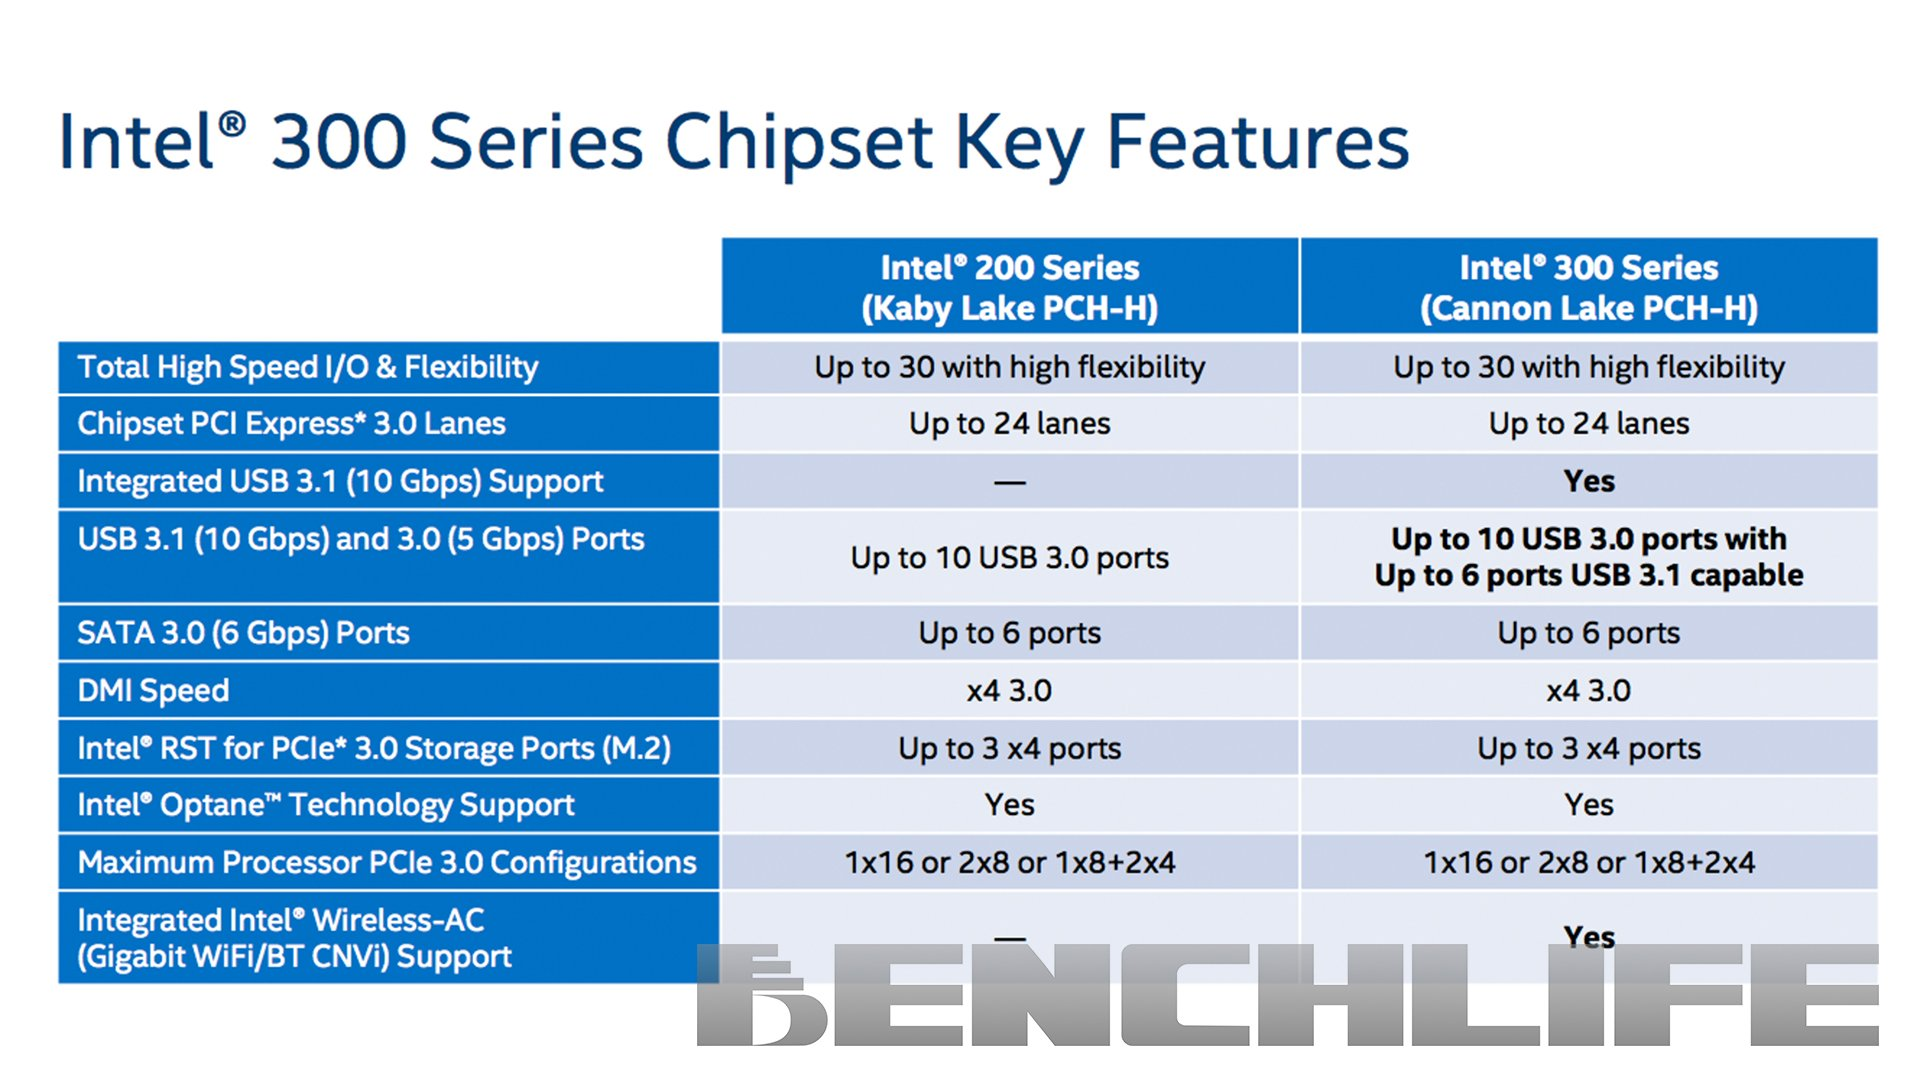 Intel 300 Series